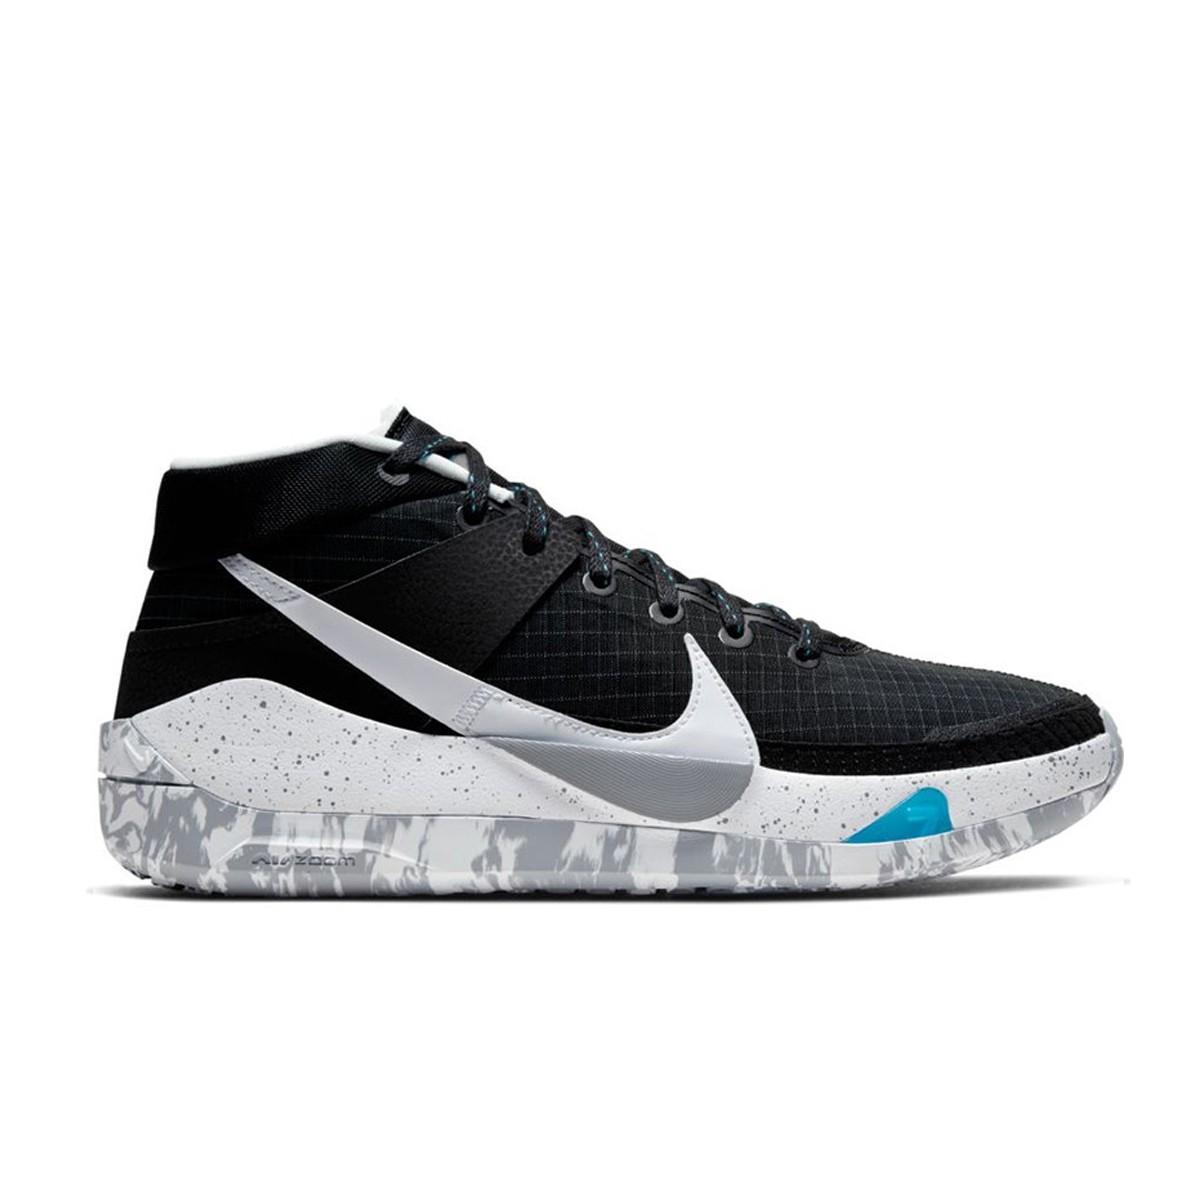 Nike KD13 'Black'